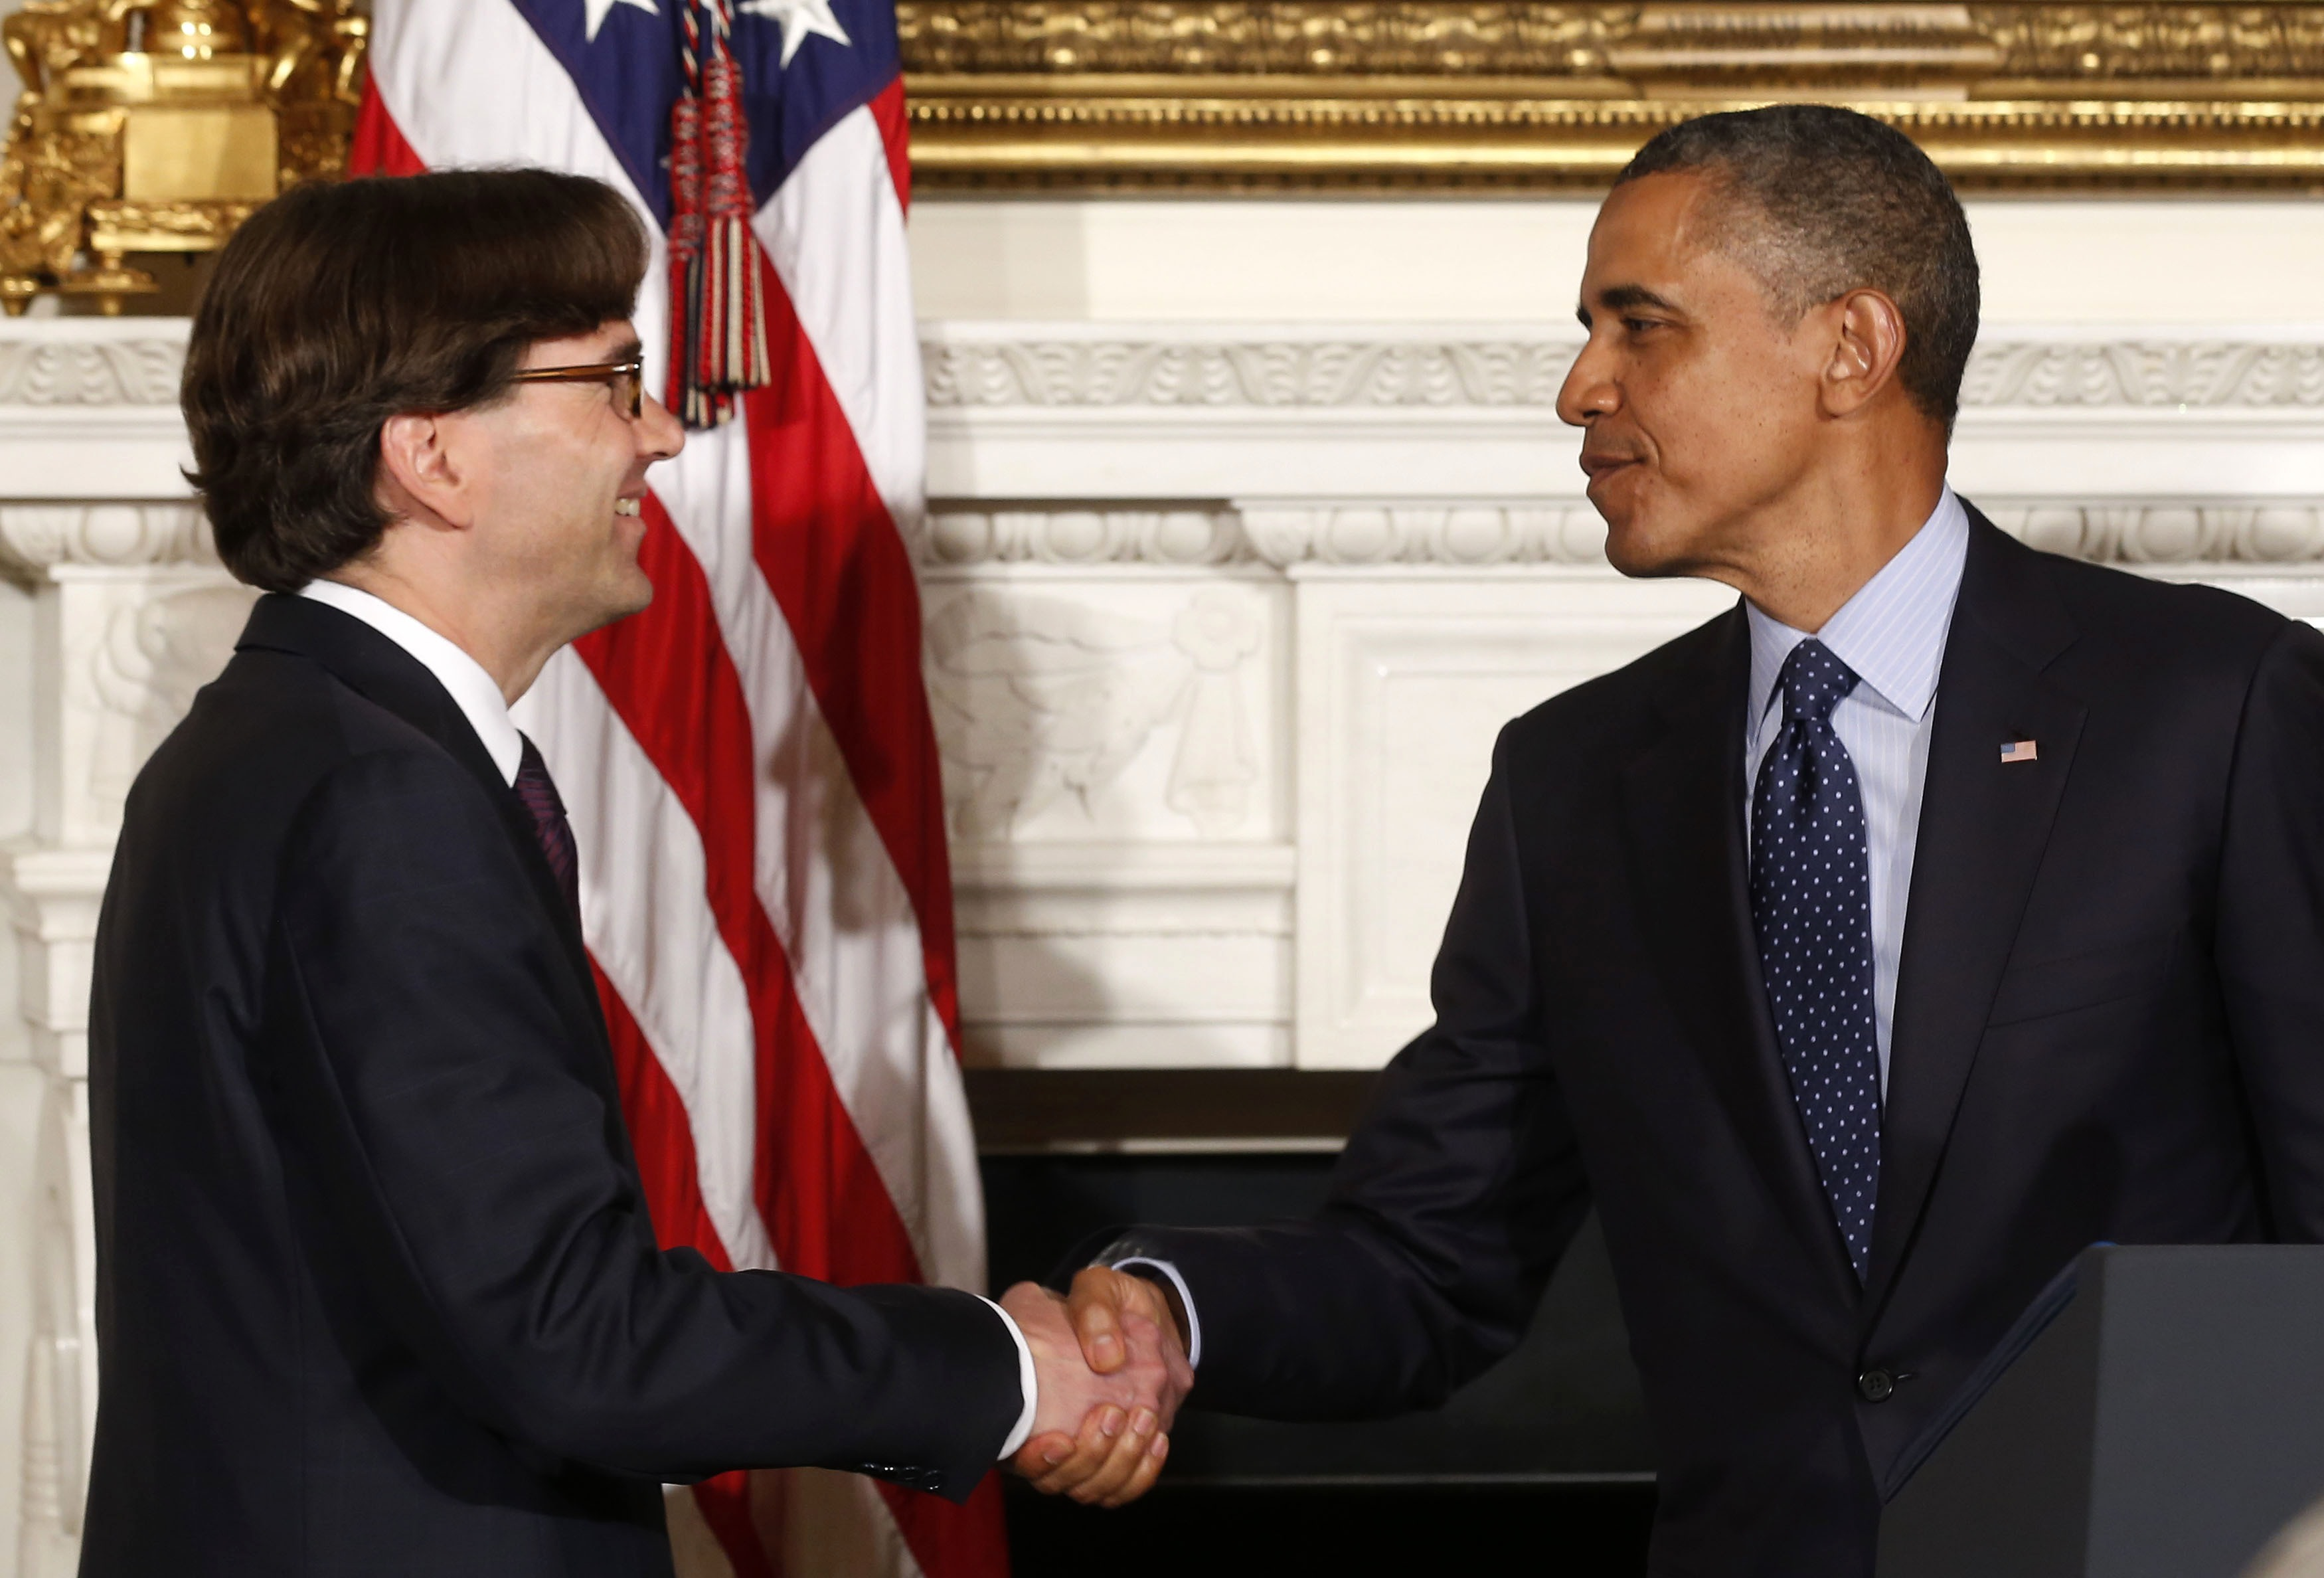 Obama names Furman as new White House chief economist